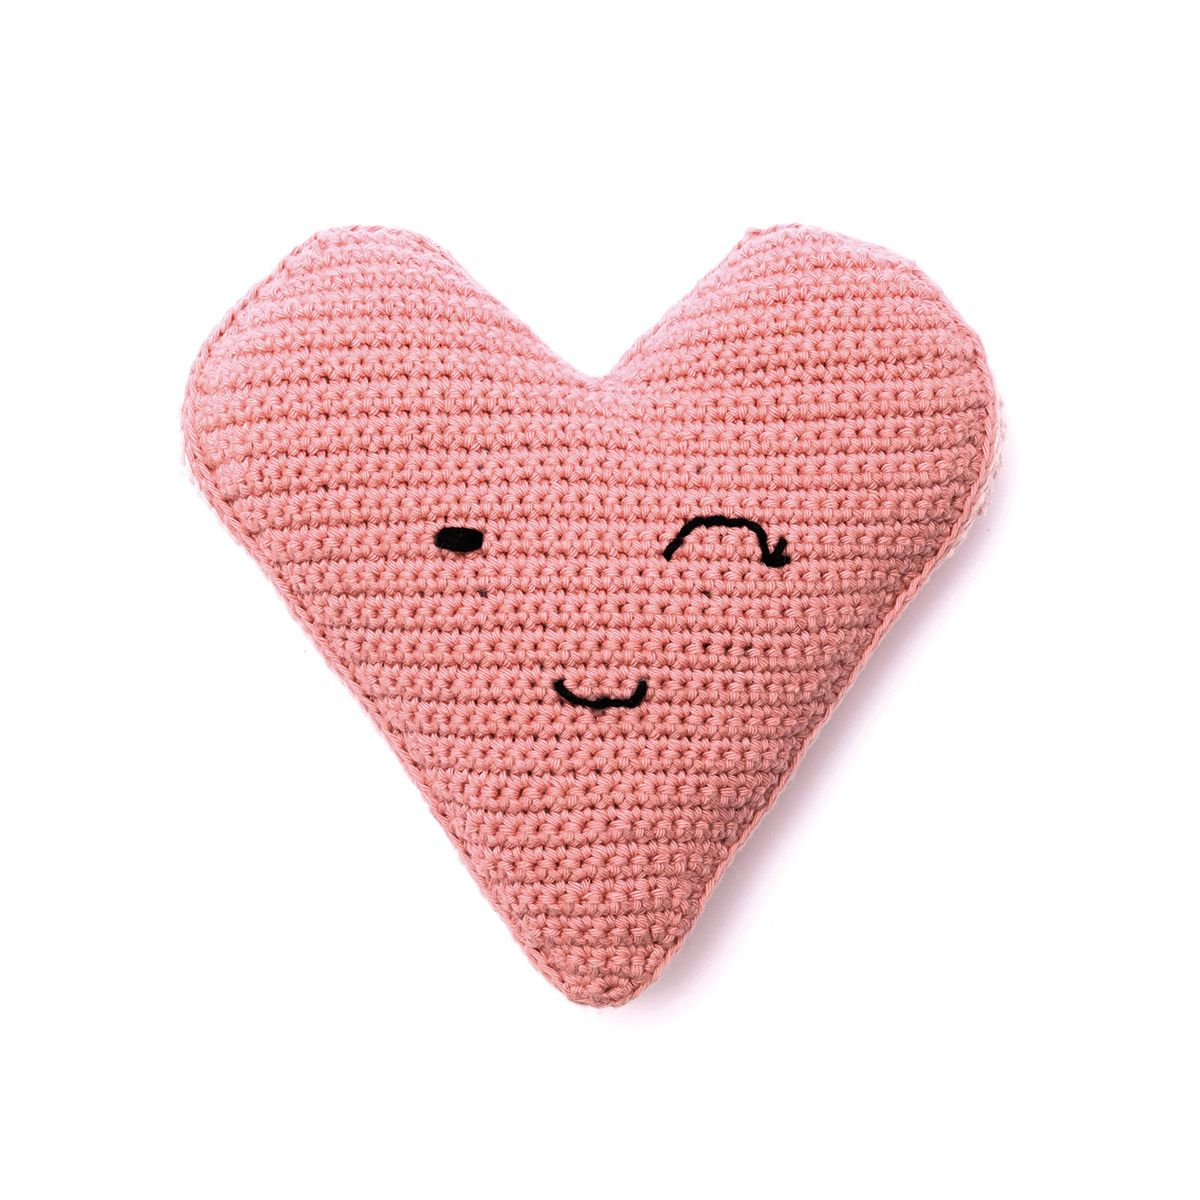 Kit crochet amigurumi - Grand coeur